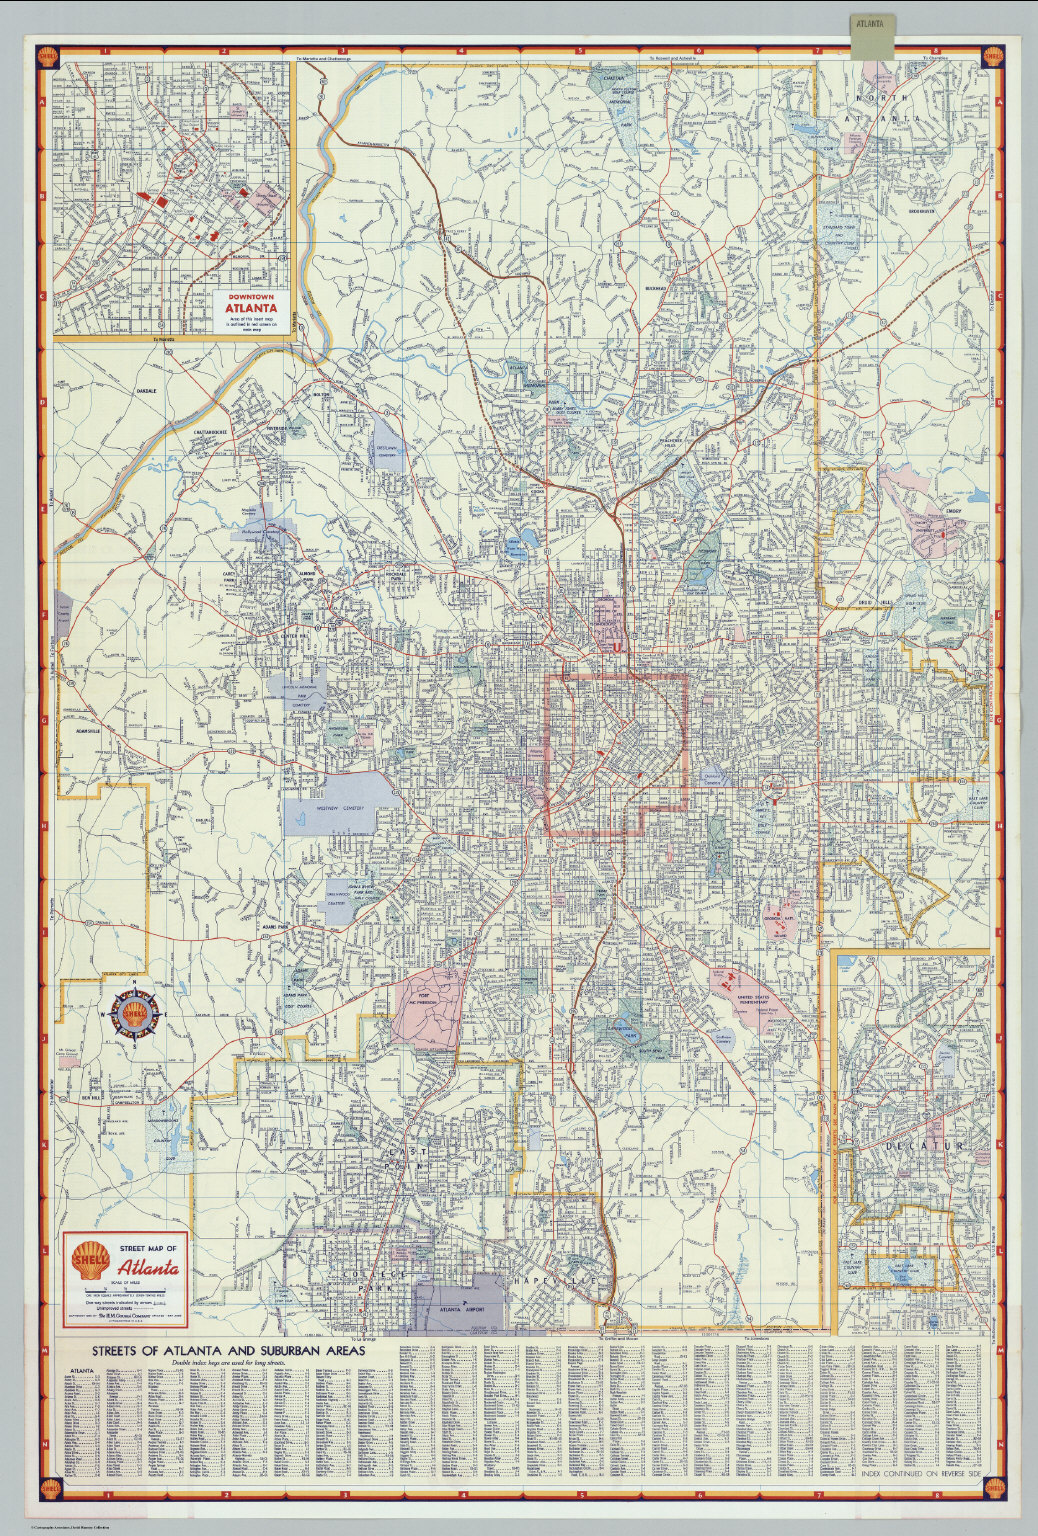 Atlanta (Georgia). - David Rumsey Historical Map Collection